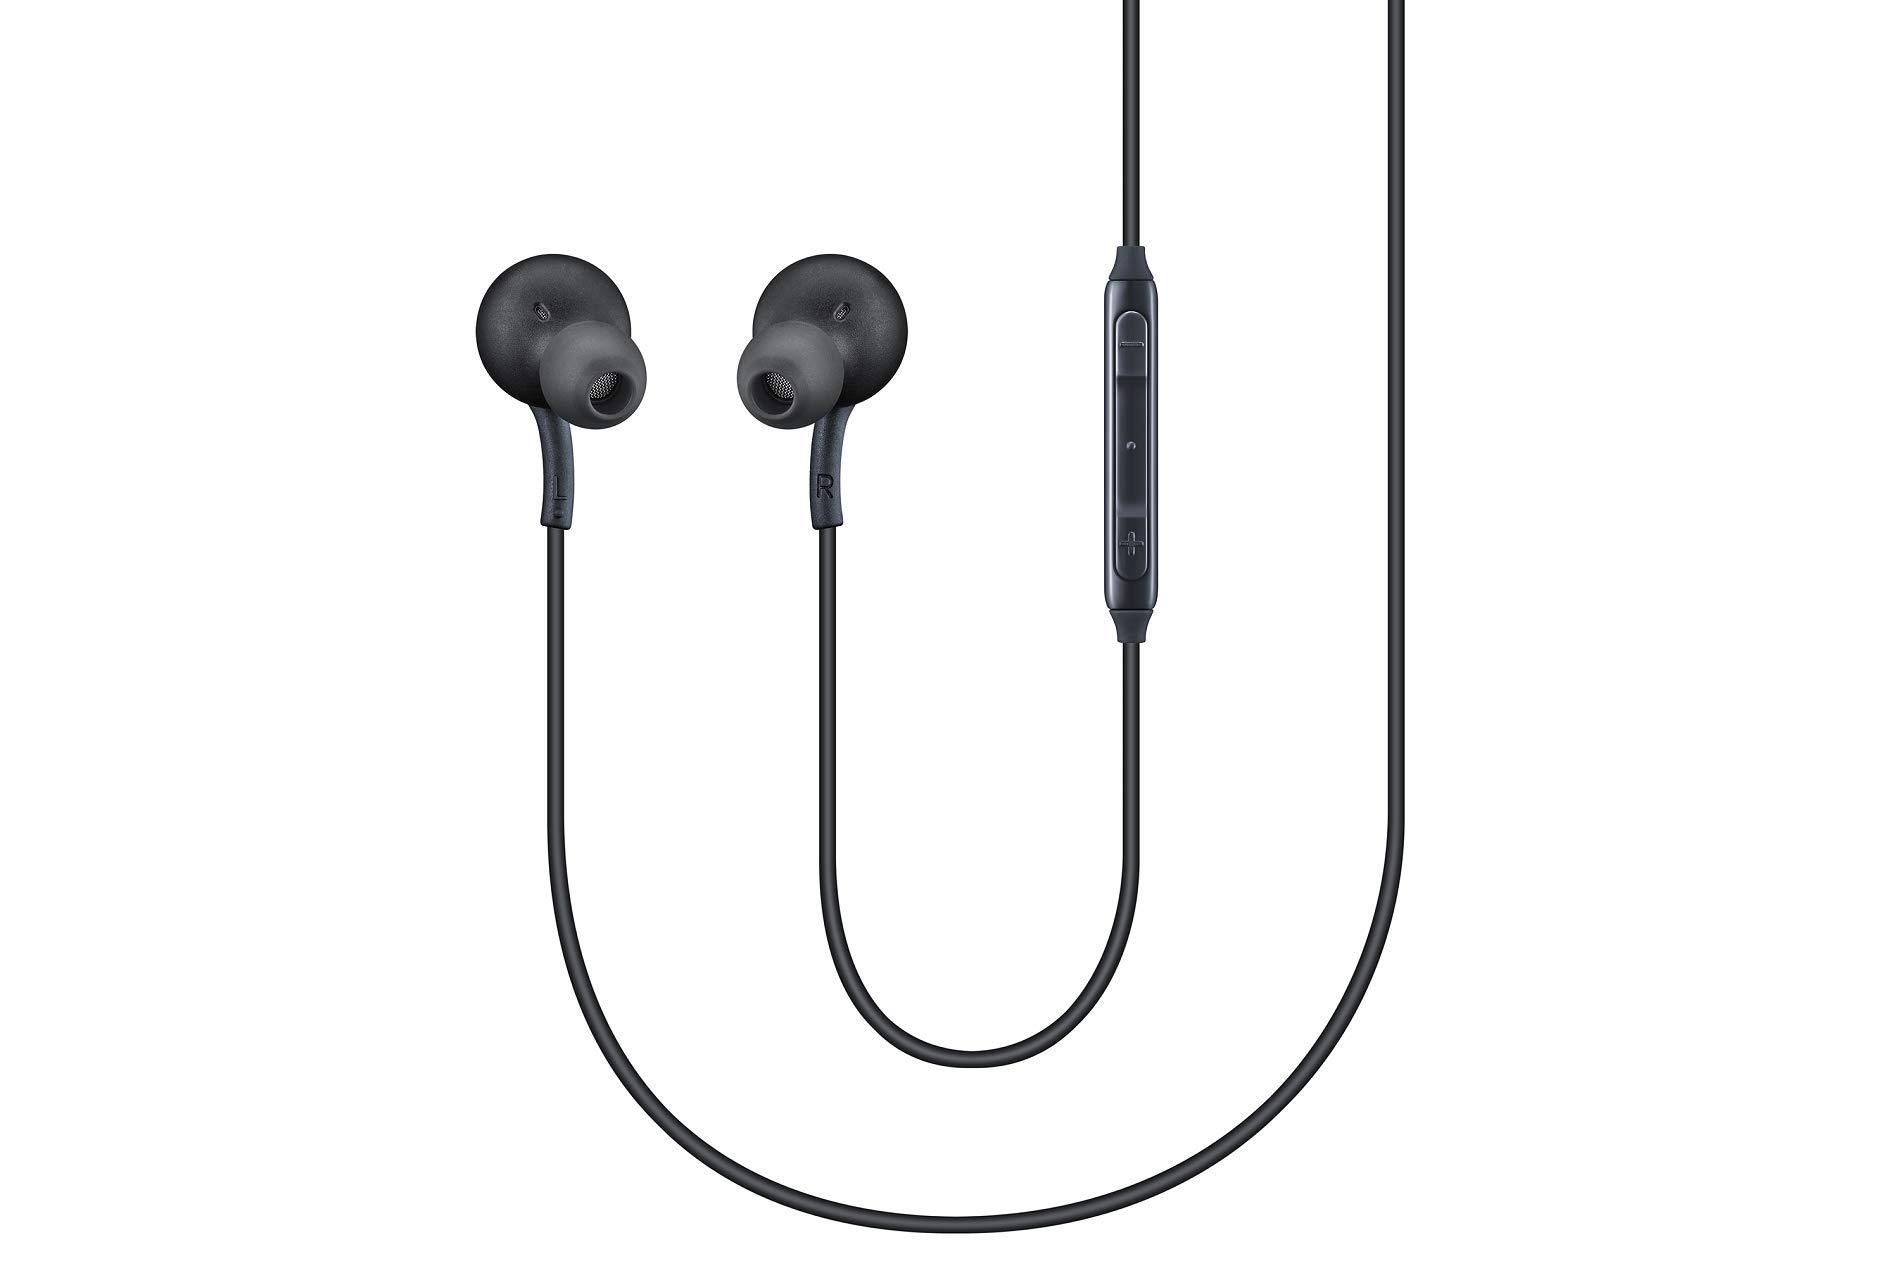 AKG Headphones, Headphones, Headset for Samsung Galaxy S8 and S8 Plus, Black [eo-ig955]